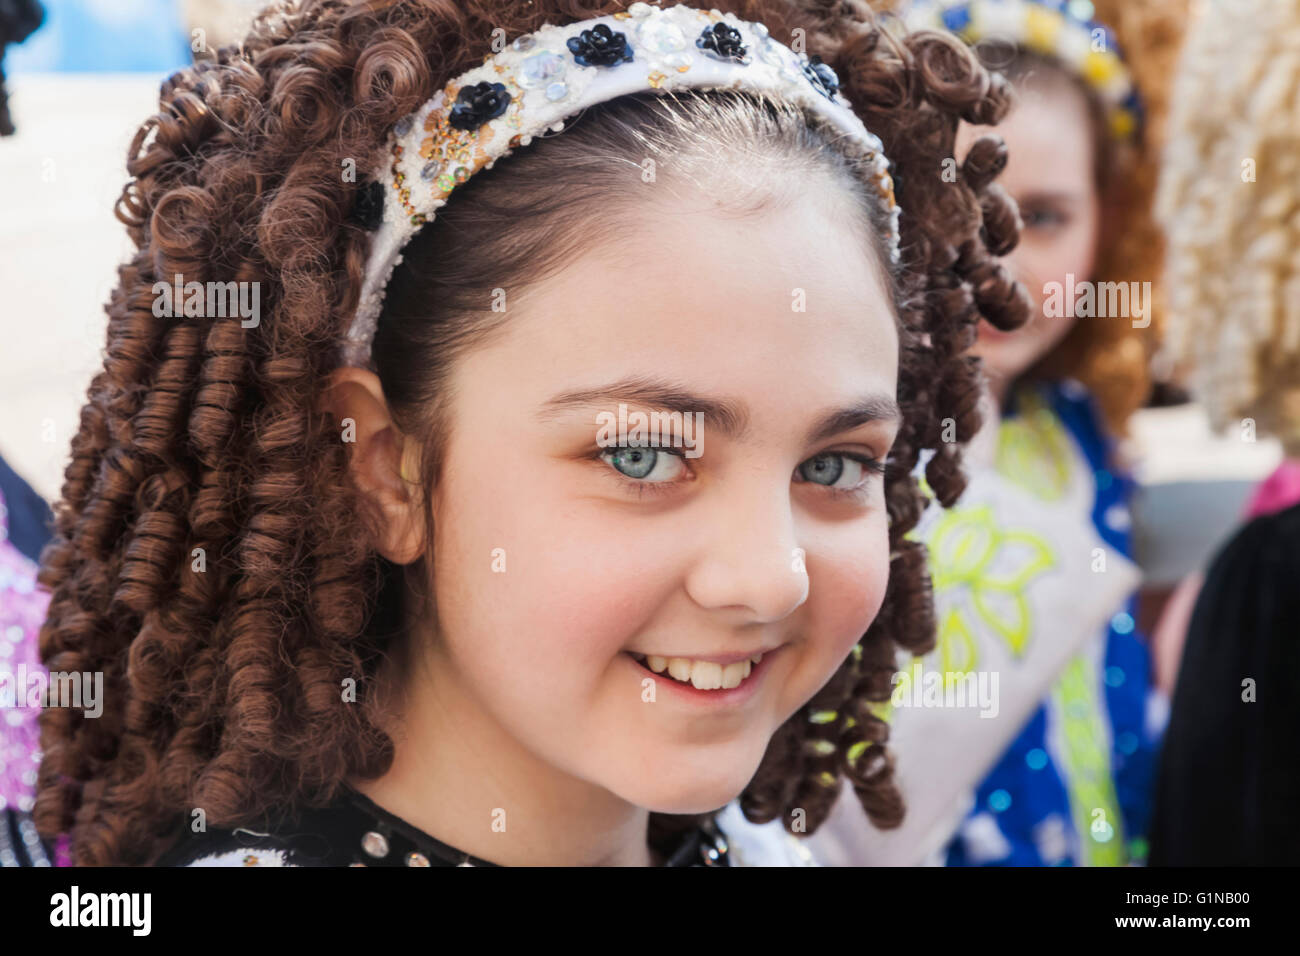 England, London, St.Patrick's Day Parade, Folk Dancer - Stock Image